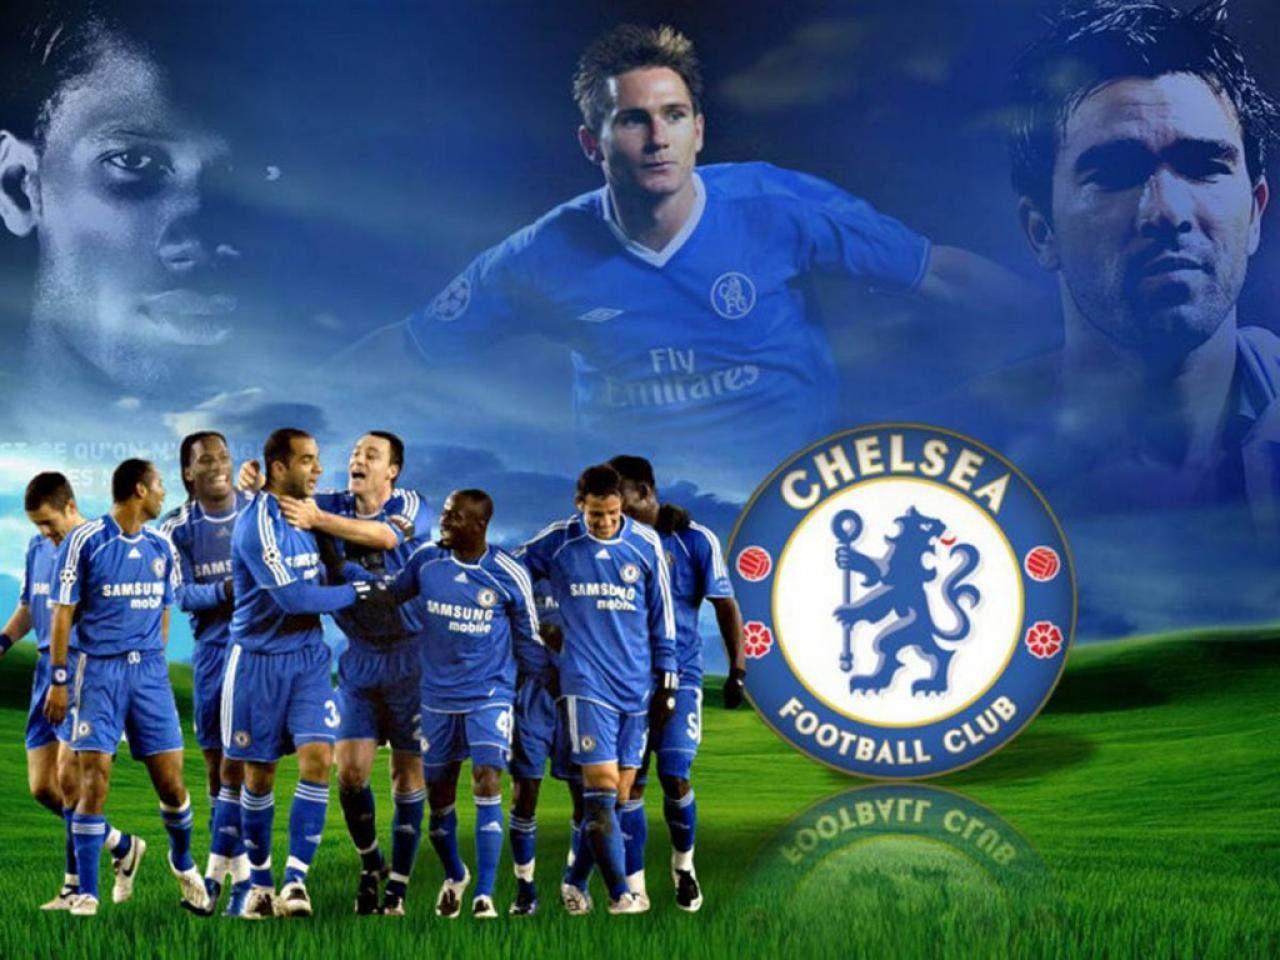 Chelsea FC Wallpaper 1280x960